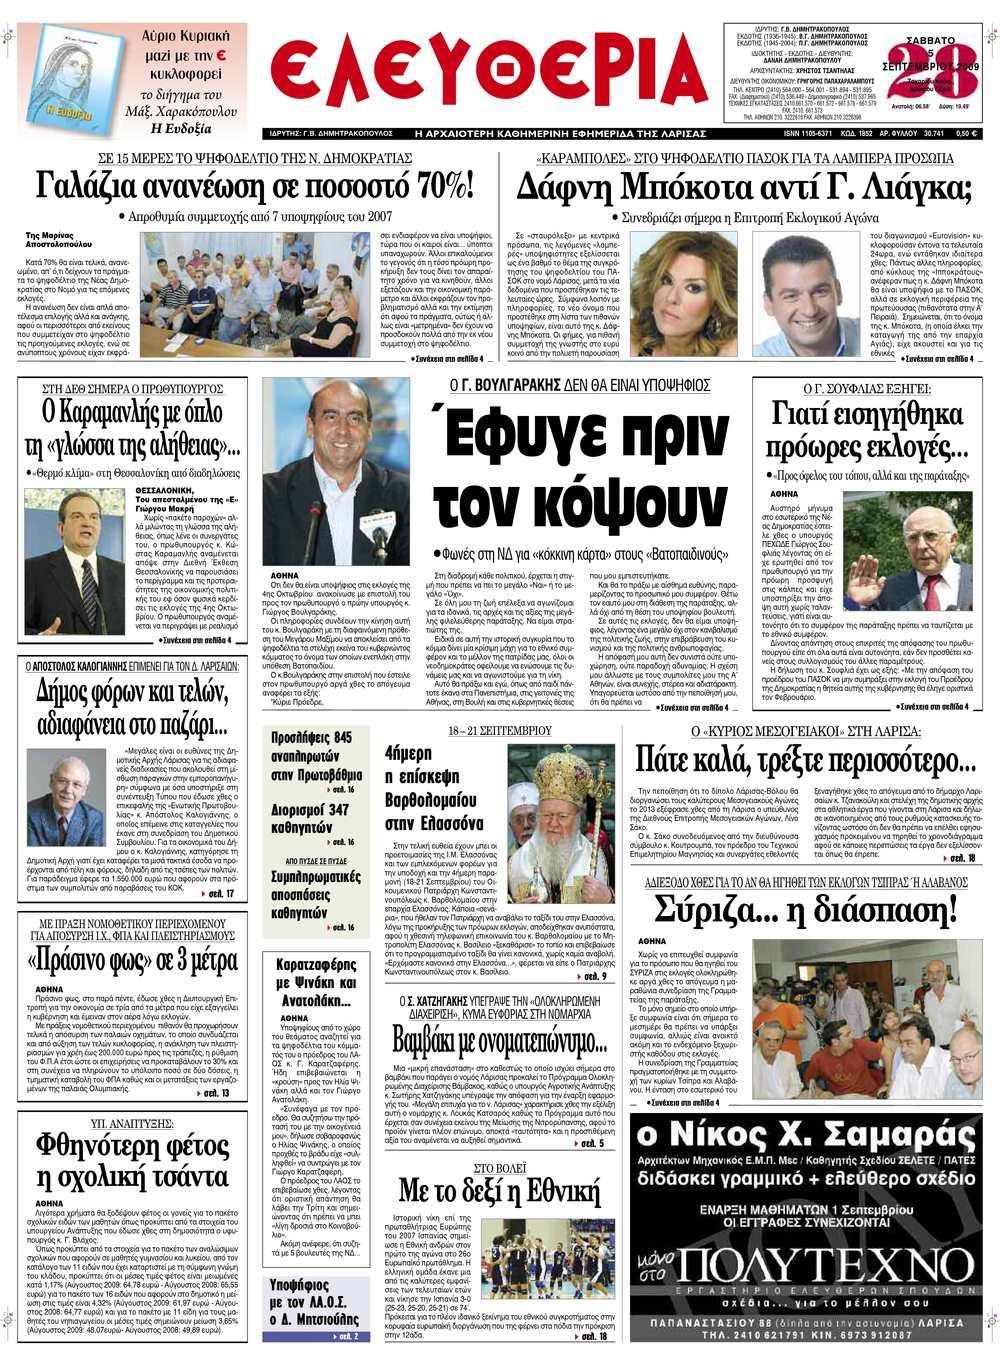 dbca144f4 Calaméo - Eleftheria.gr_5/9/2009